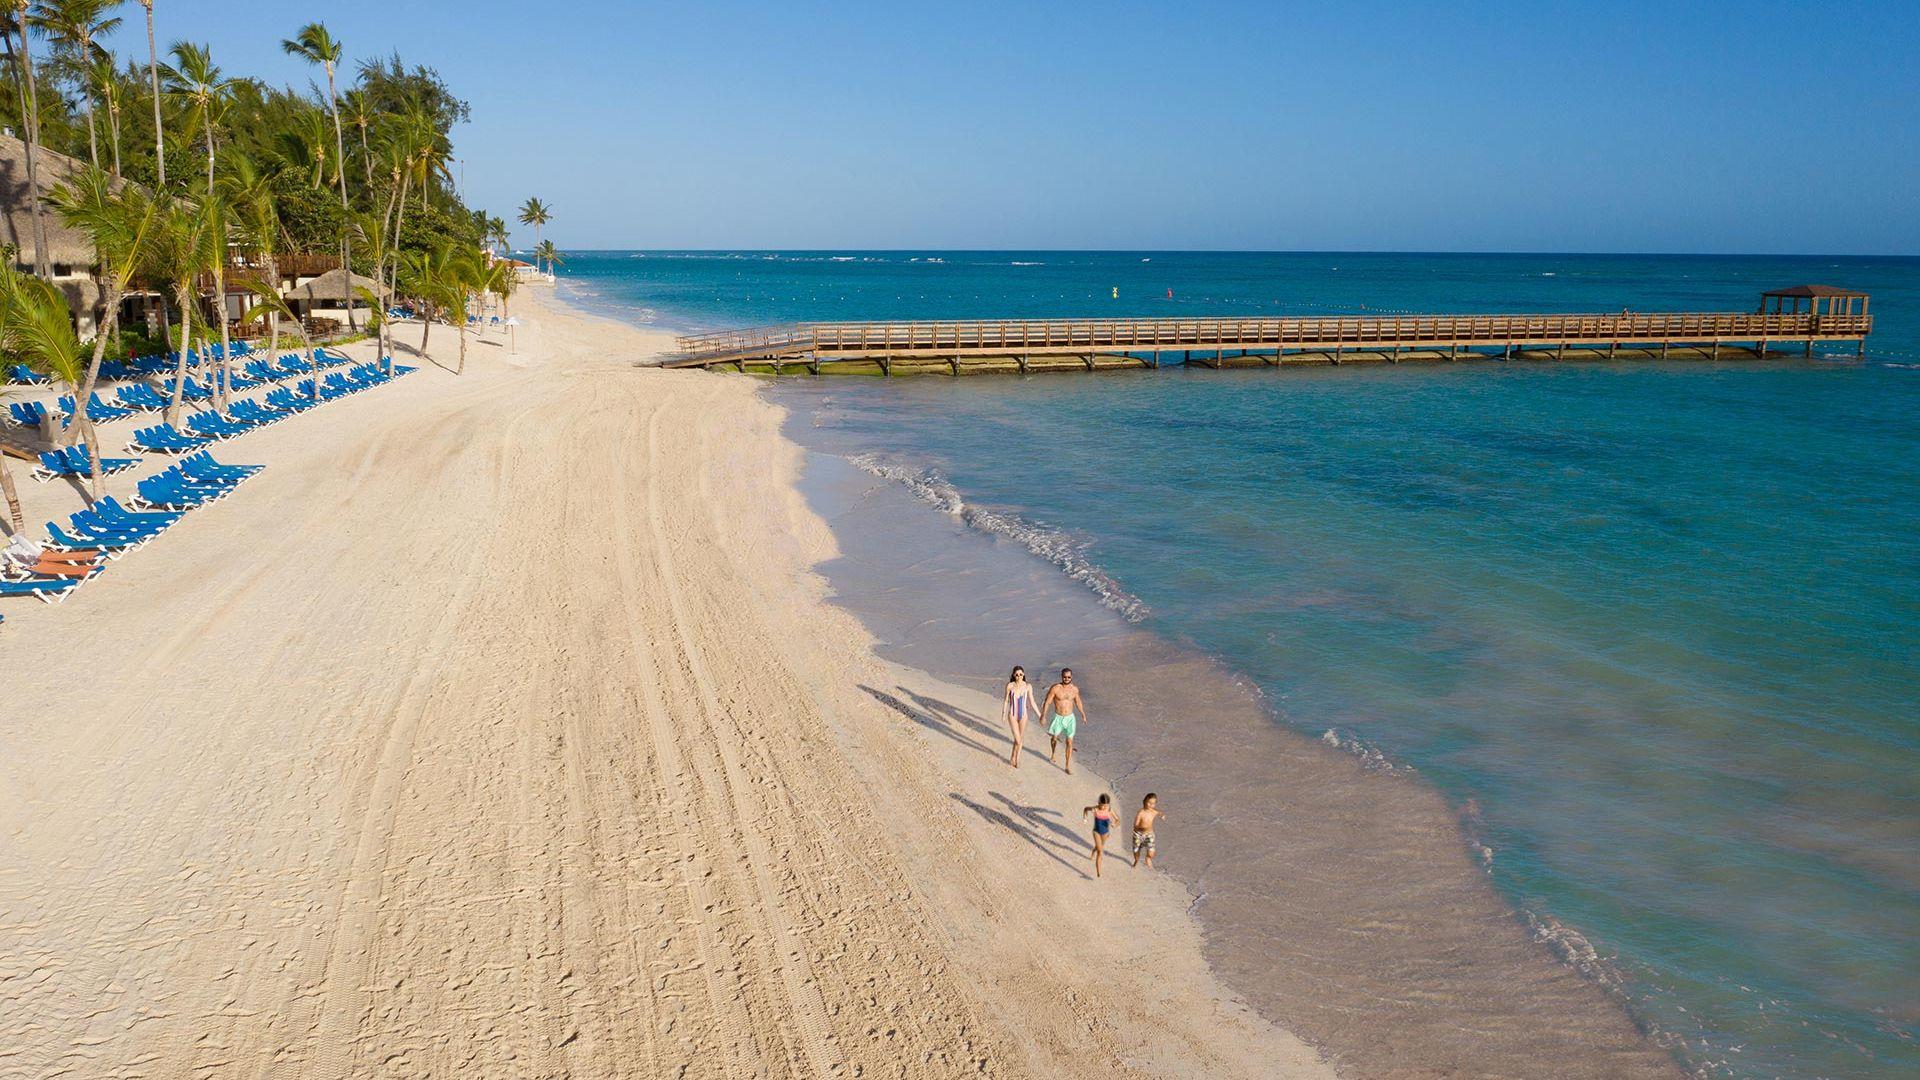 Sejur plaja Punta Cana, 10 zile - octombrie 2021